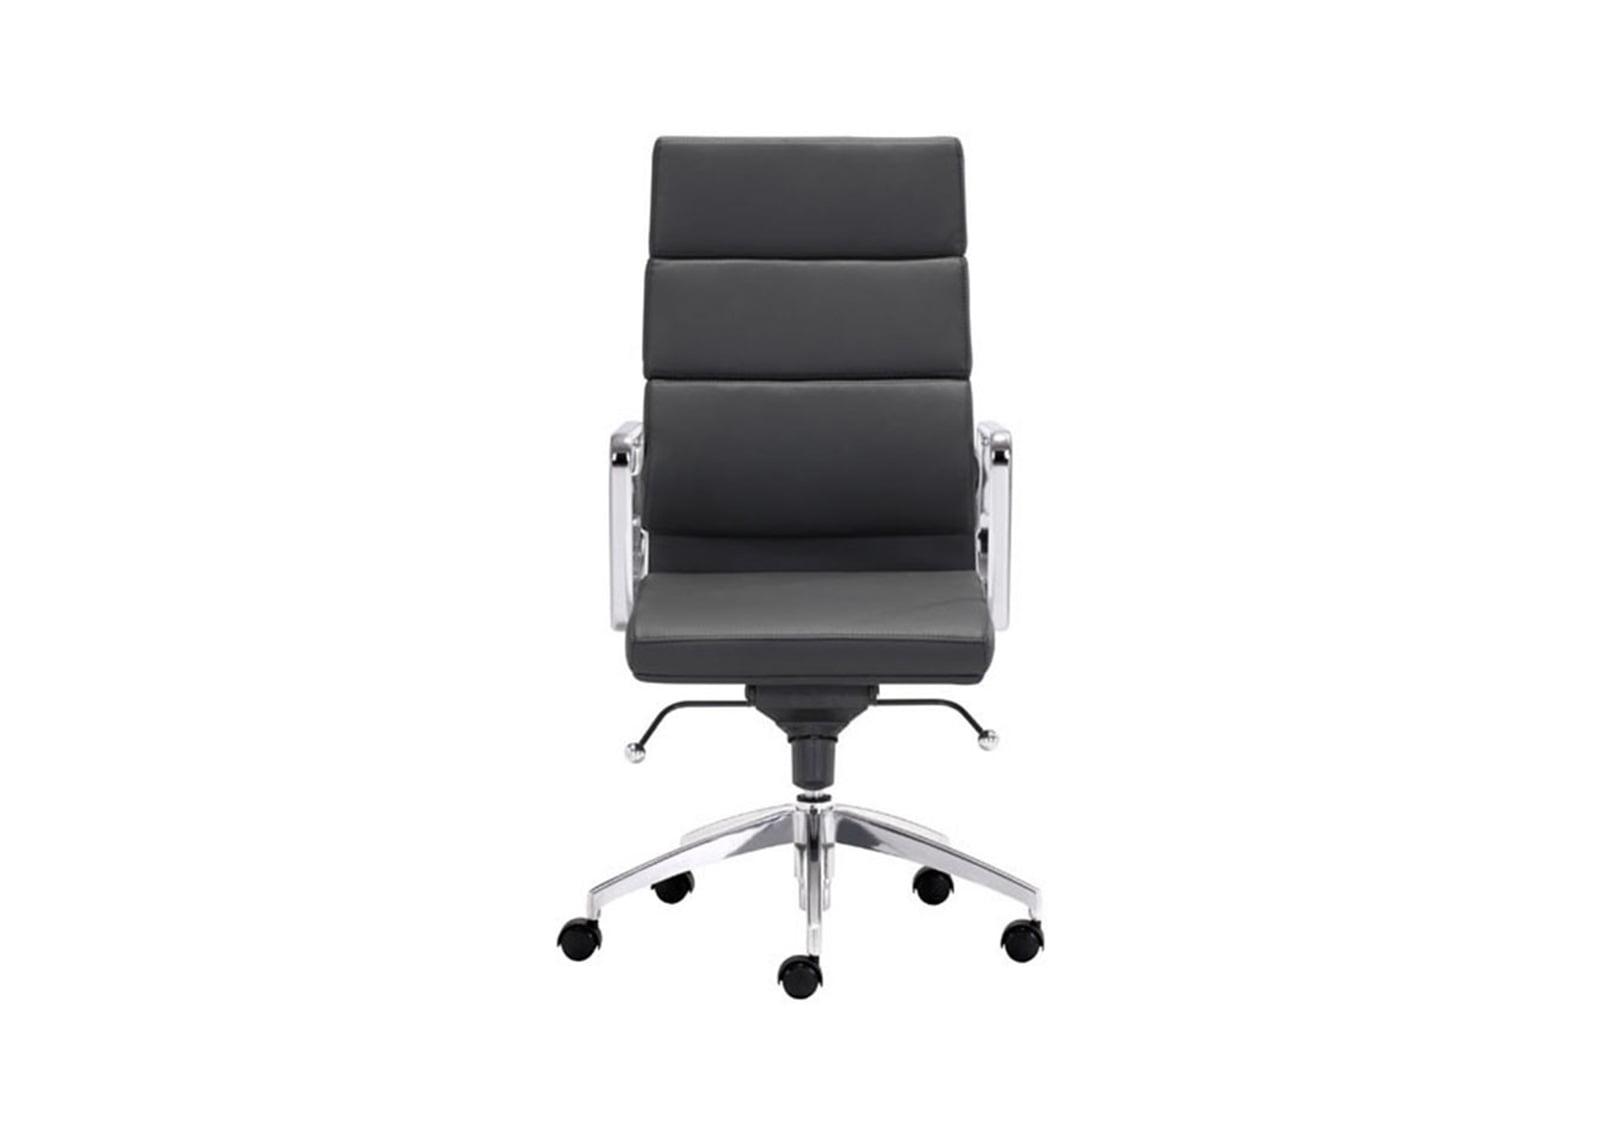 Engineer High Back Office Chair Black Furnishplus